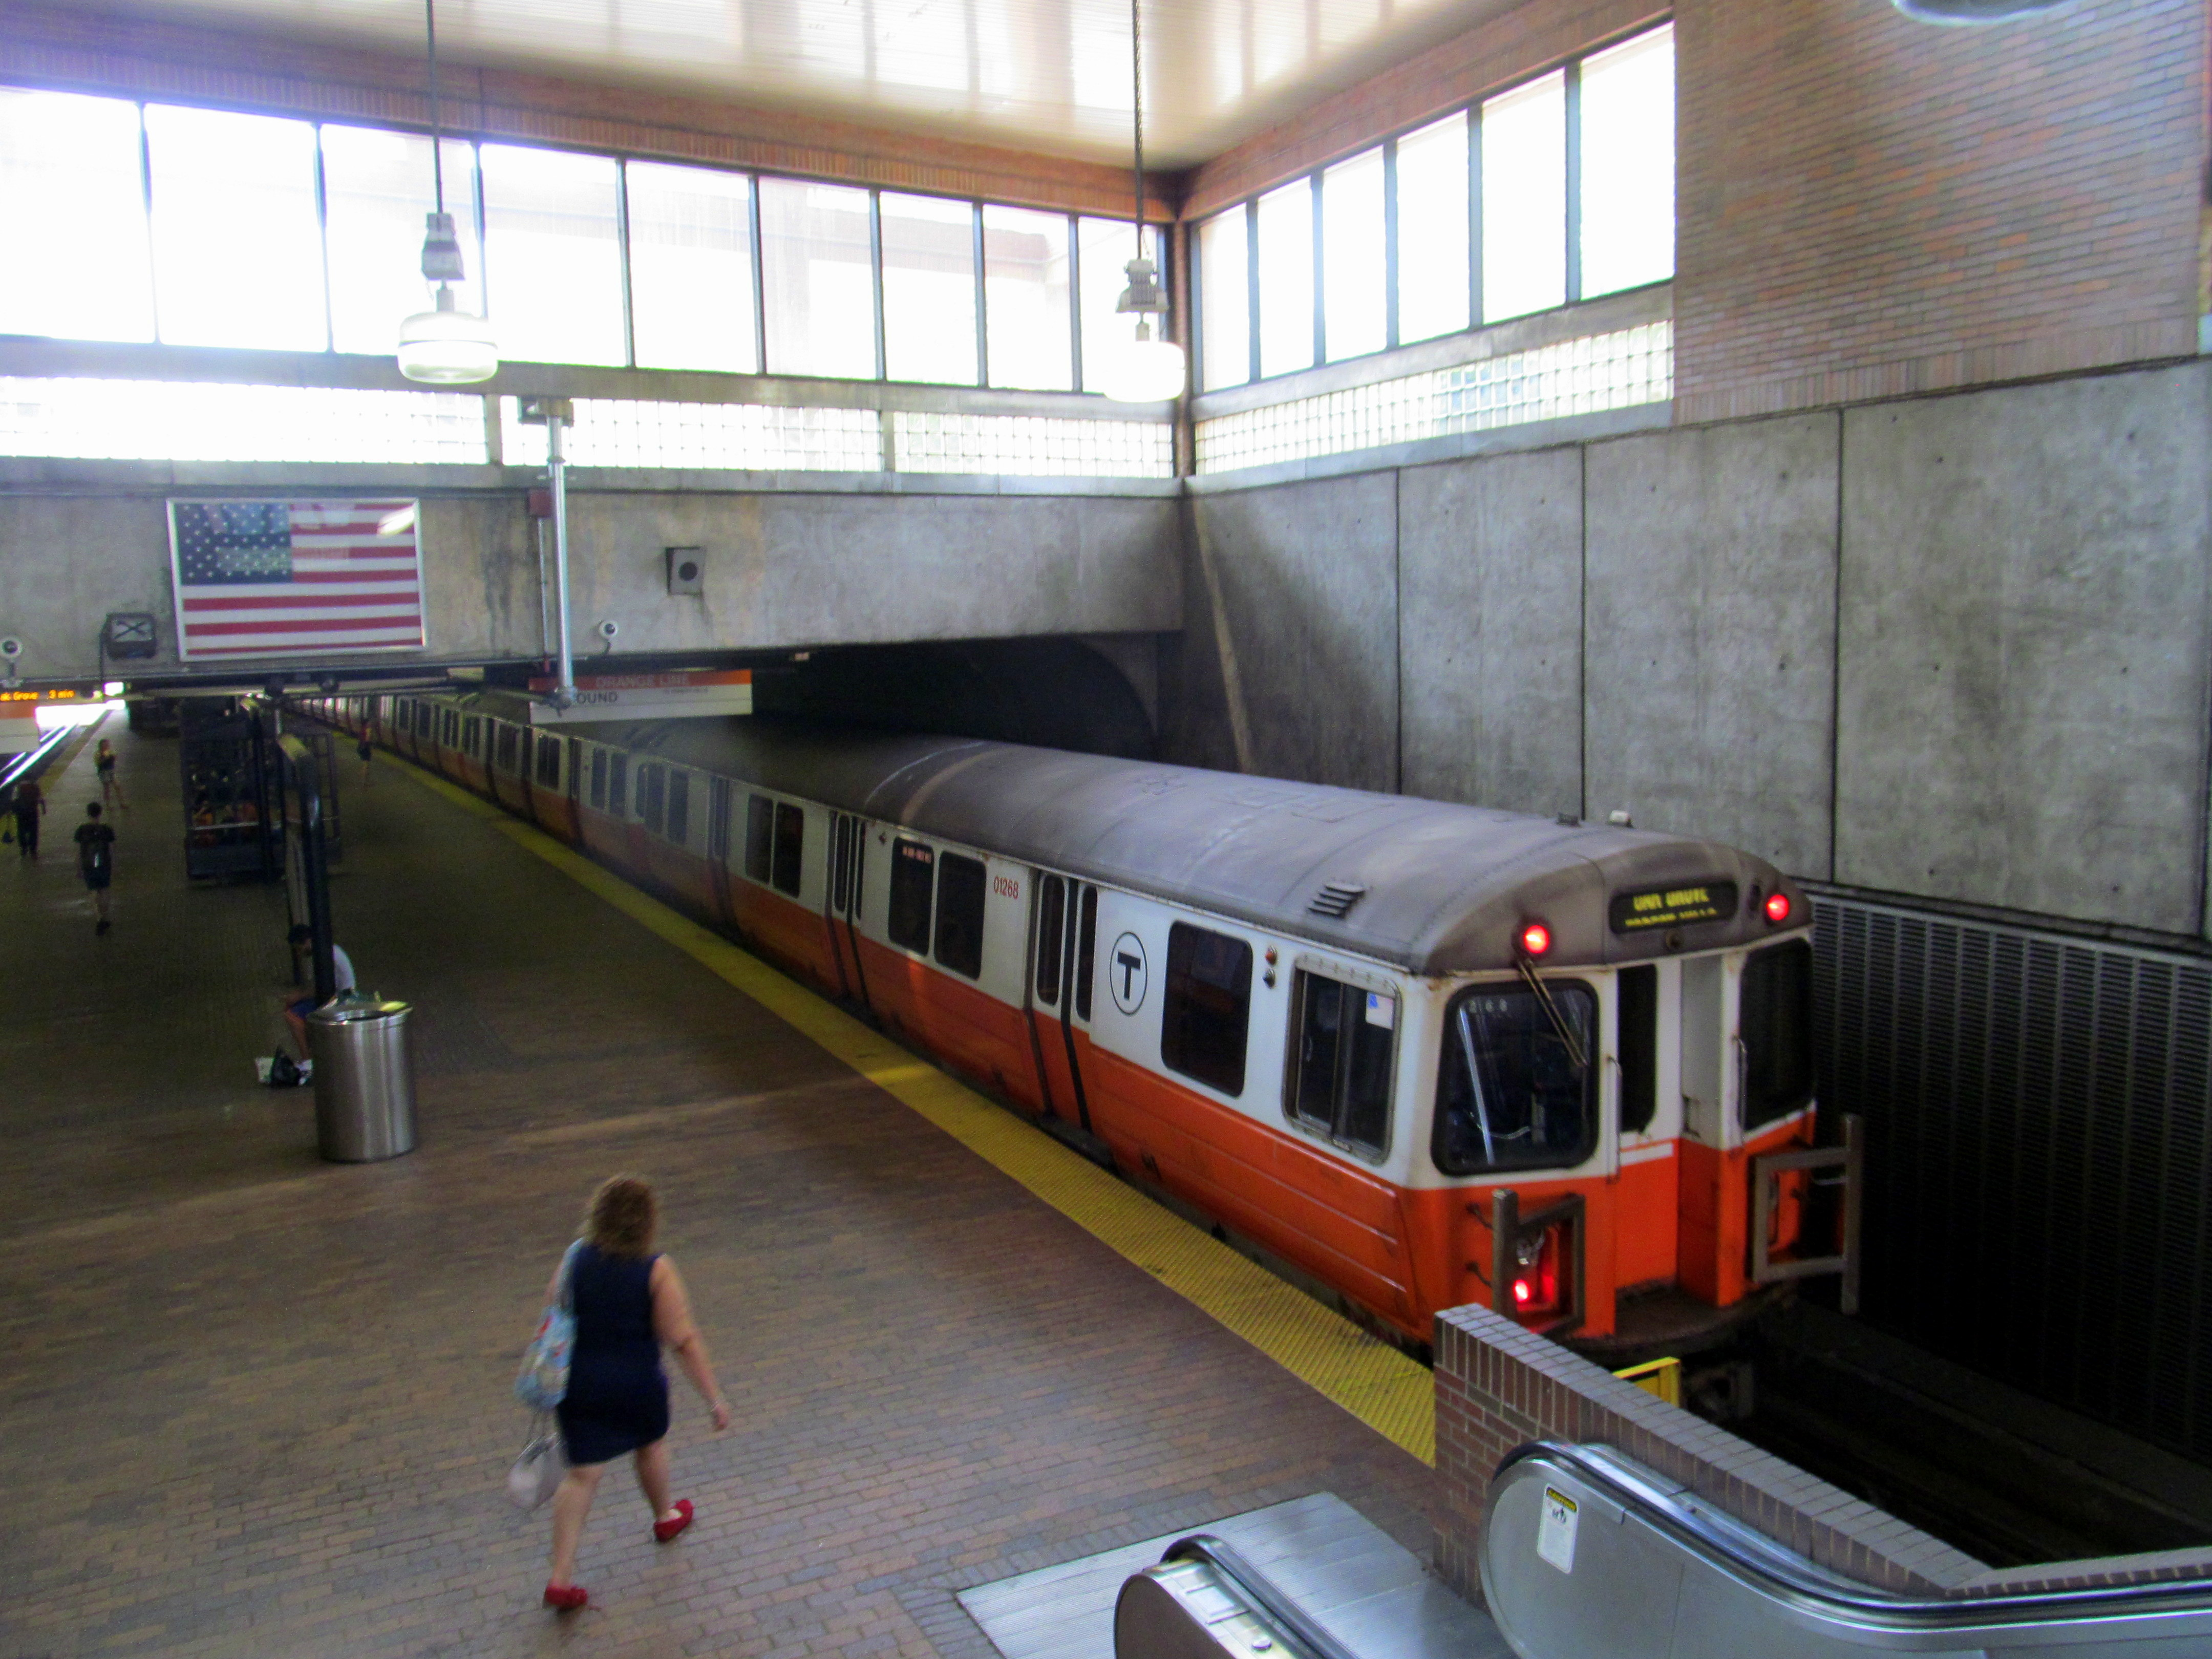 Filembta orange line train at stony brook july 2016g filembta orange line train at stony brook july 2016g sciox Gallery